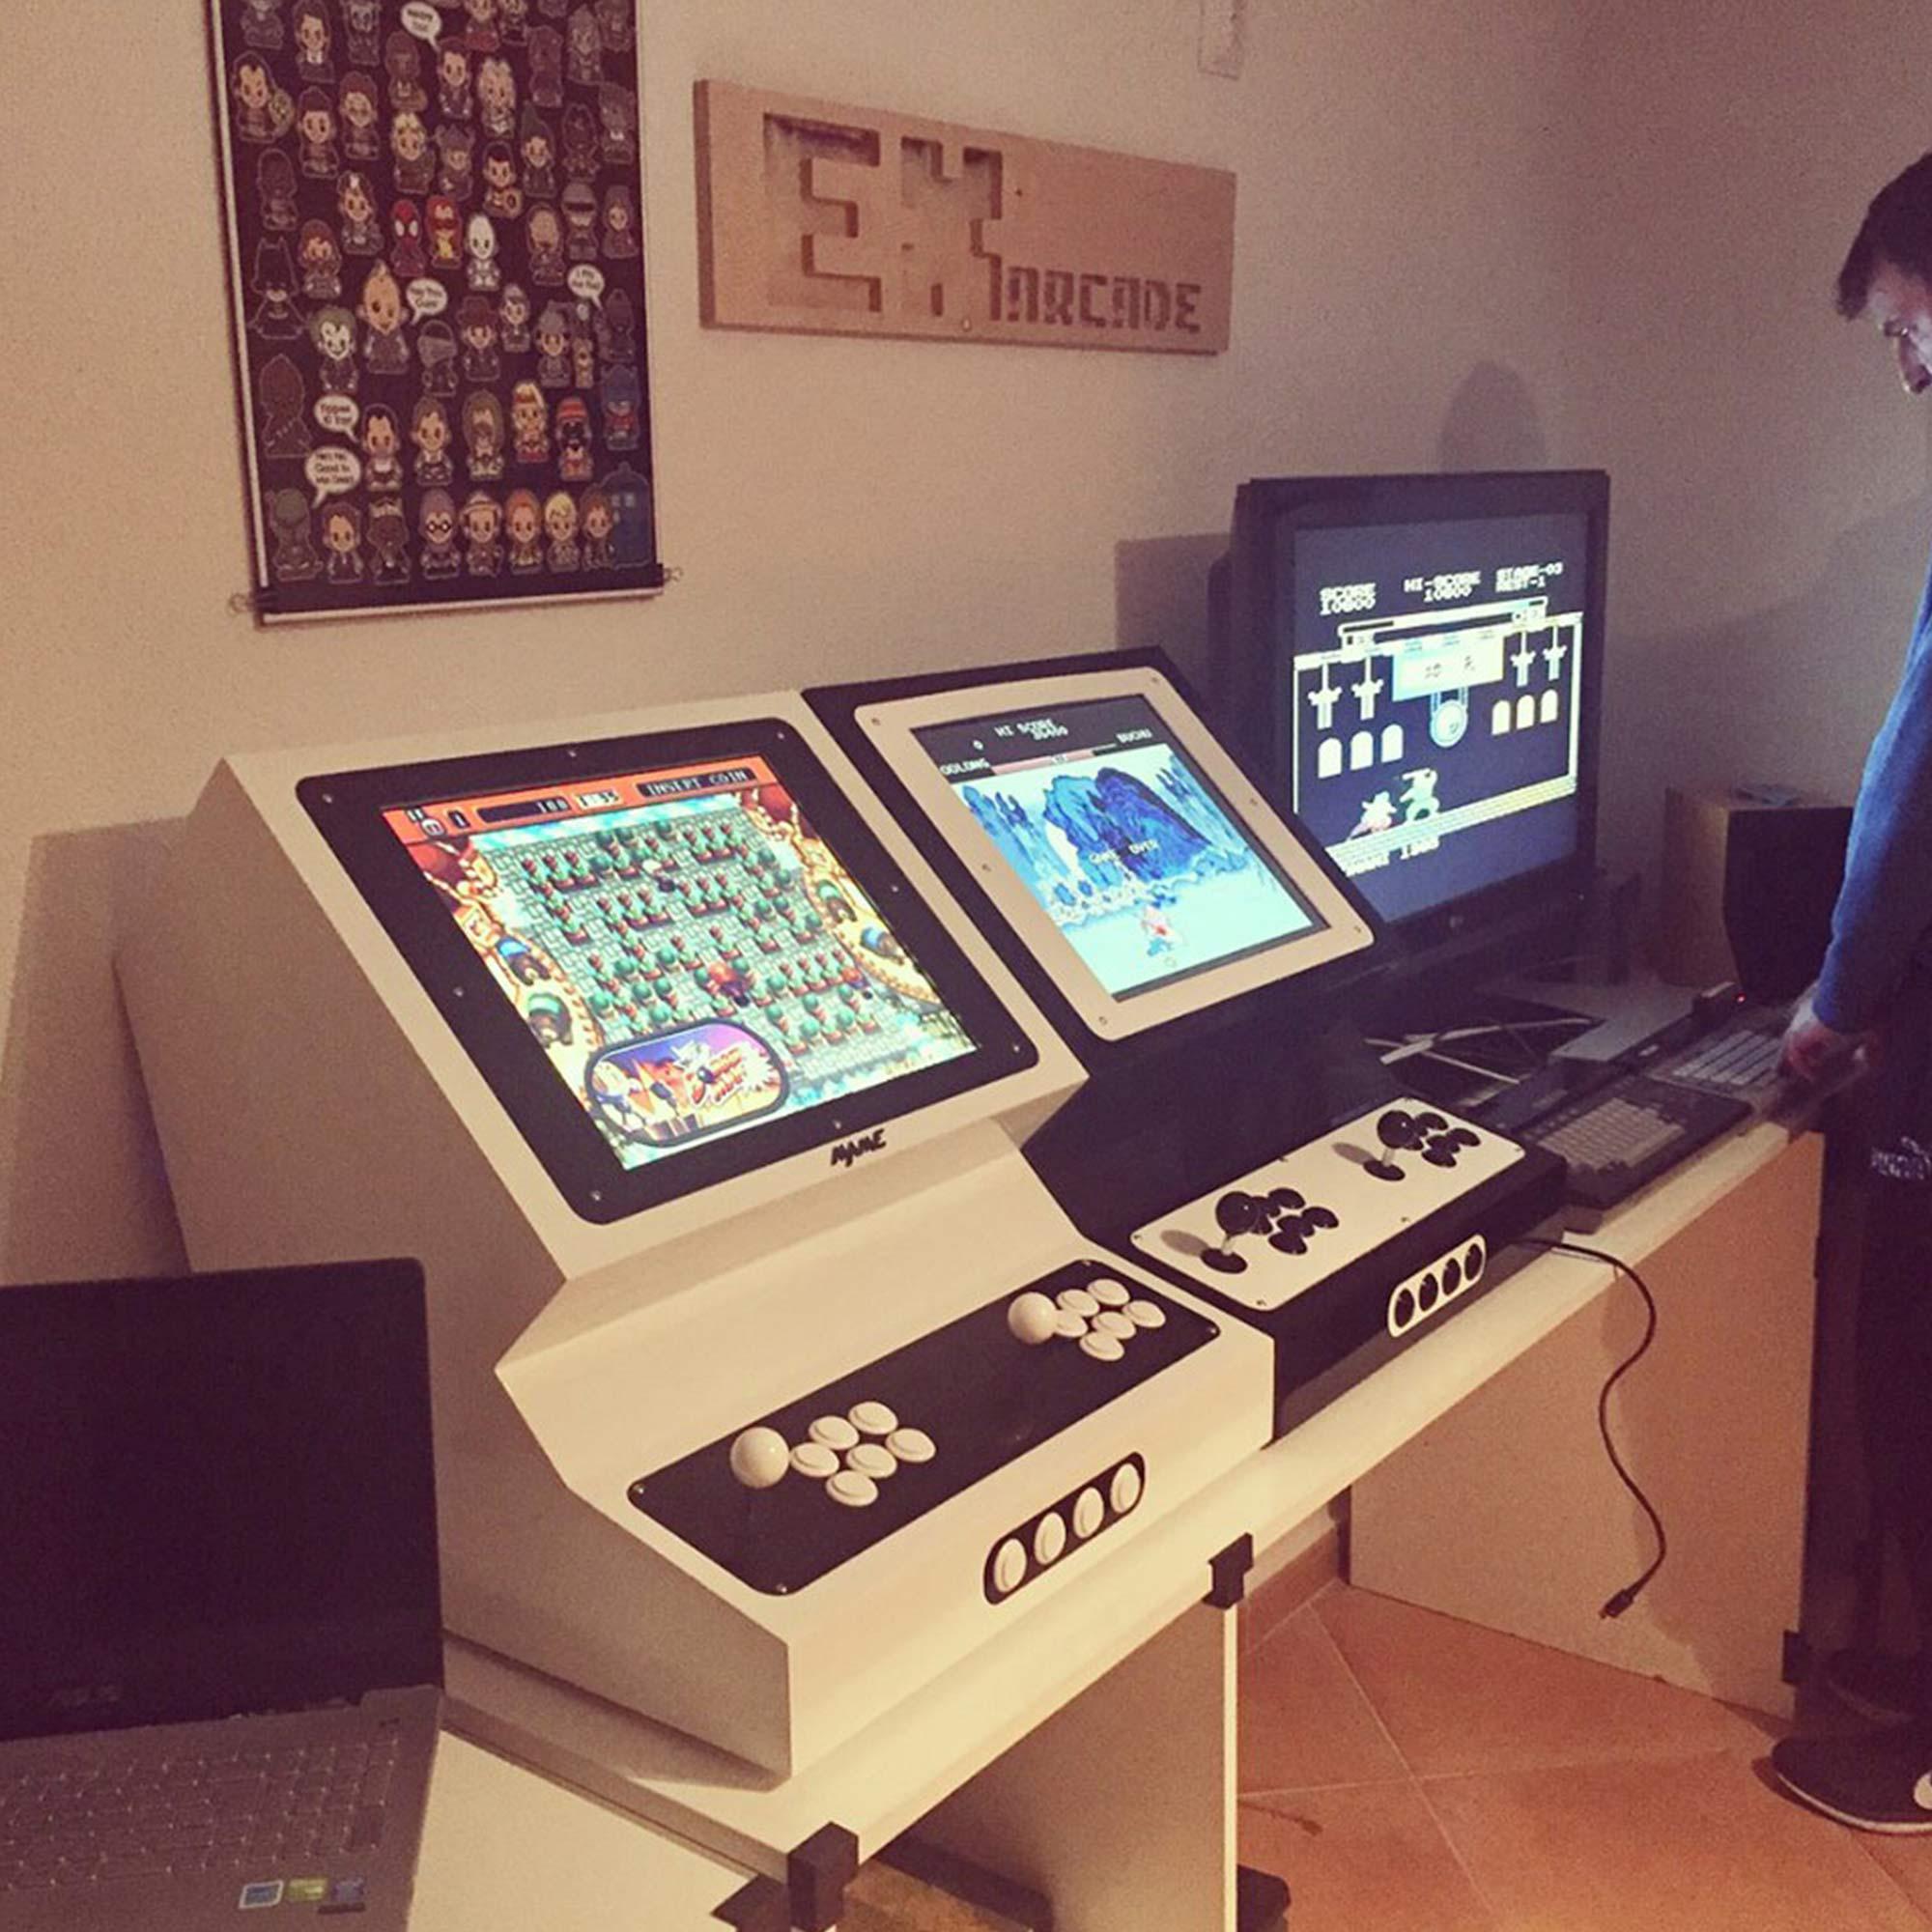 EX-arcade-_-Diseño-_-EXarchitects_04